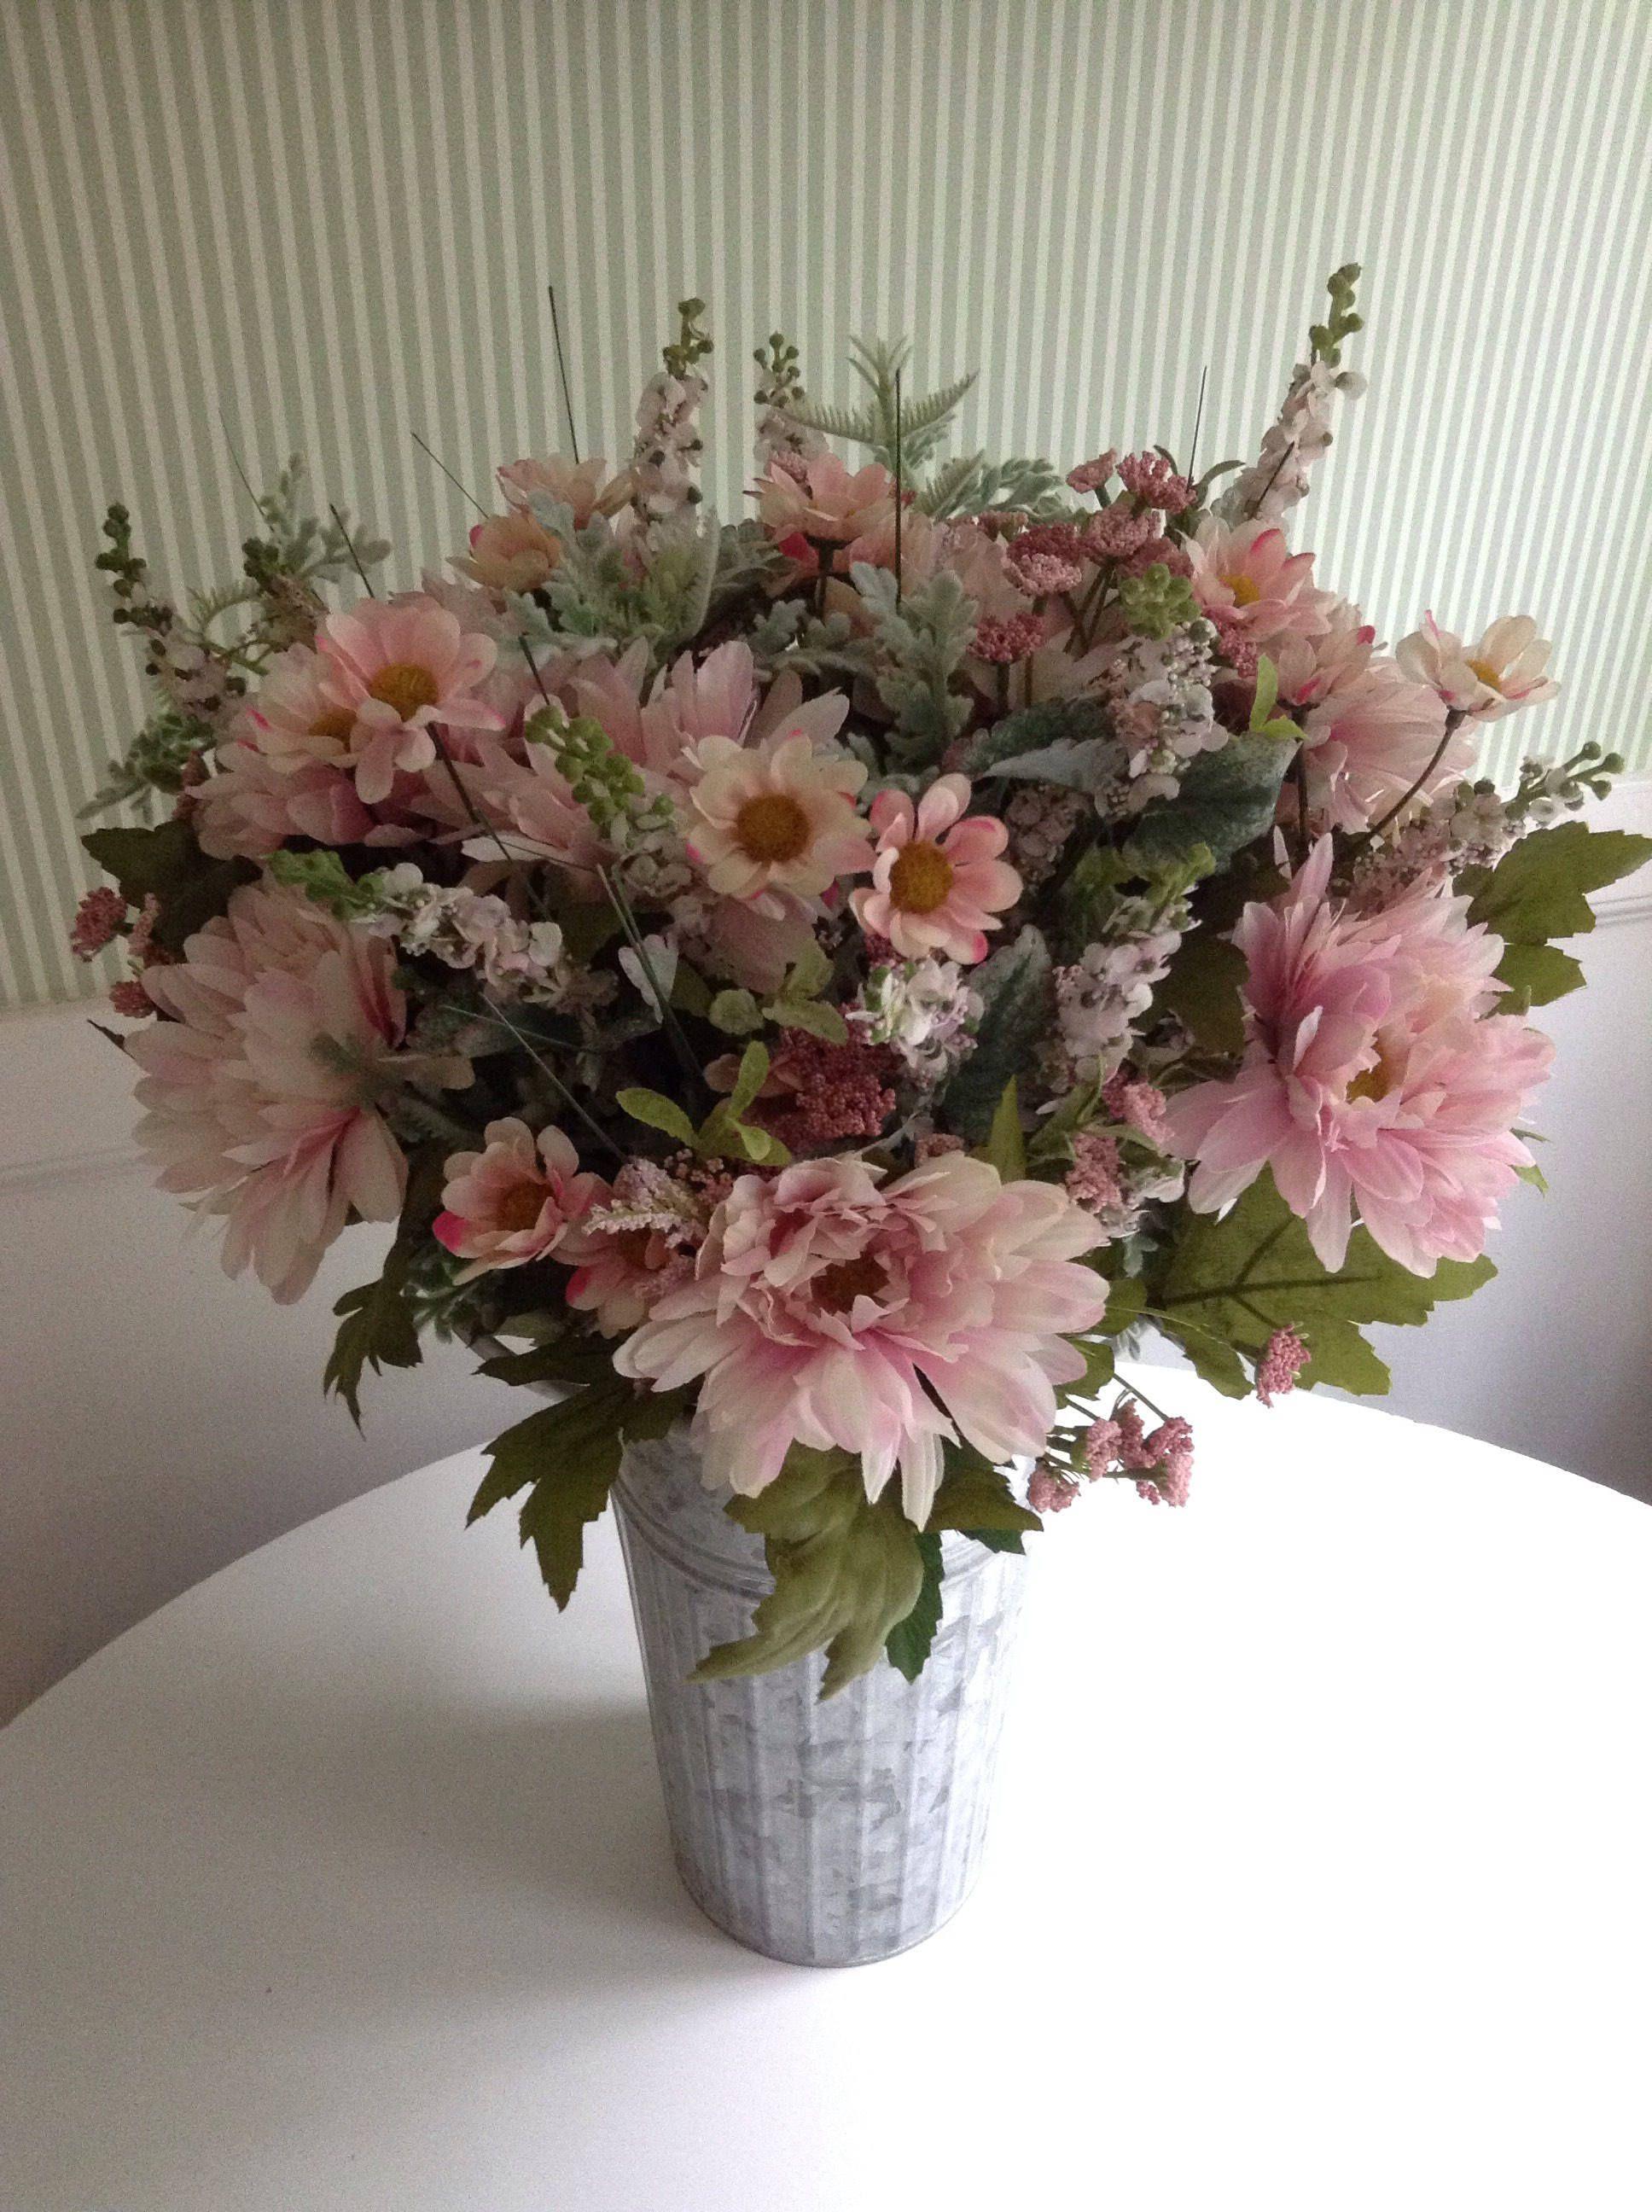 Springsummer Pale Pink Floral Arrangement In Galvanized Tin Flower